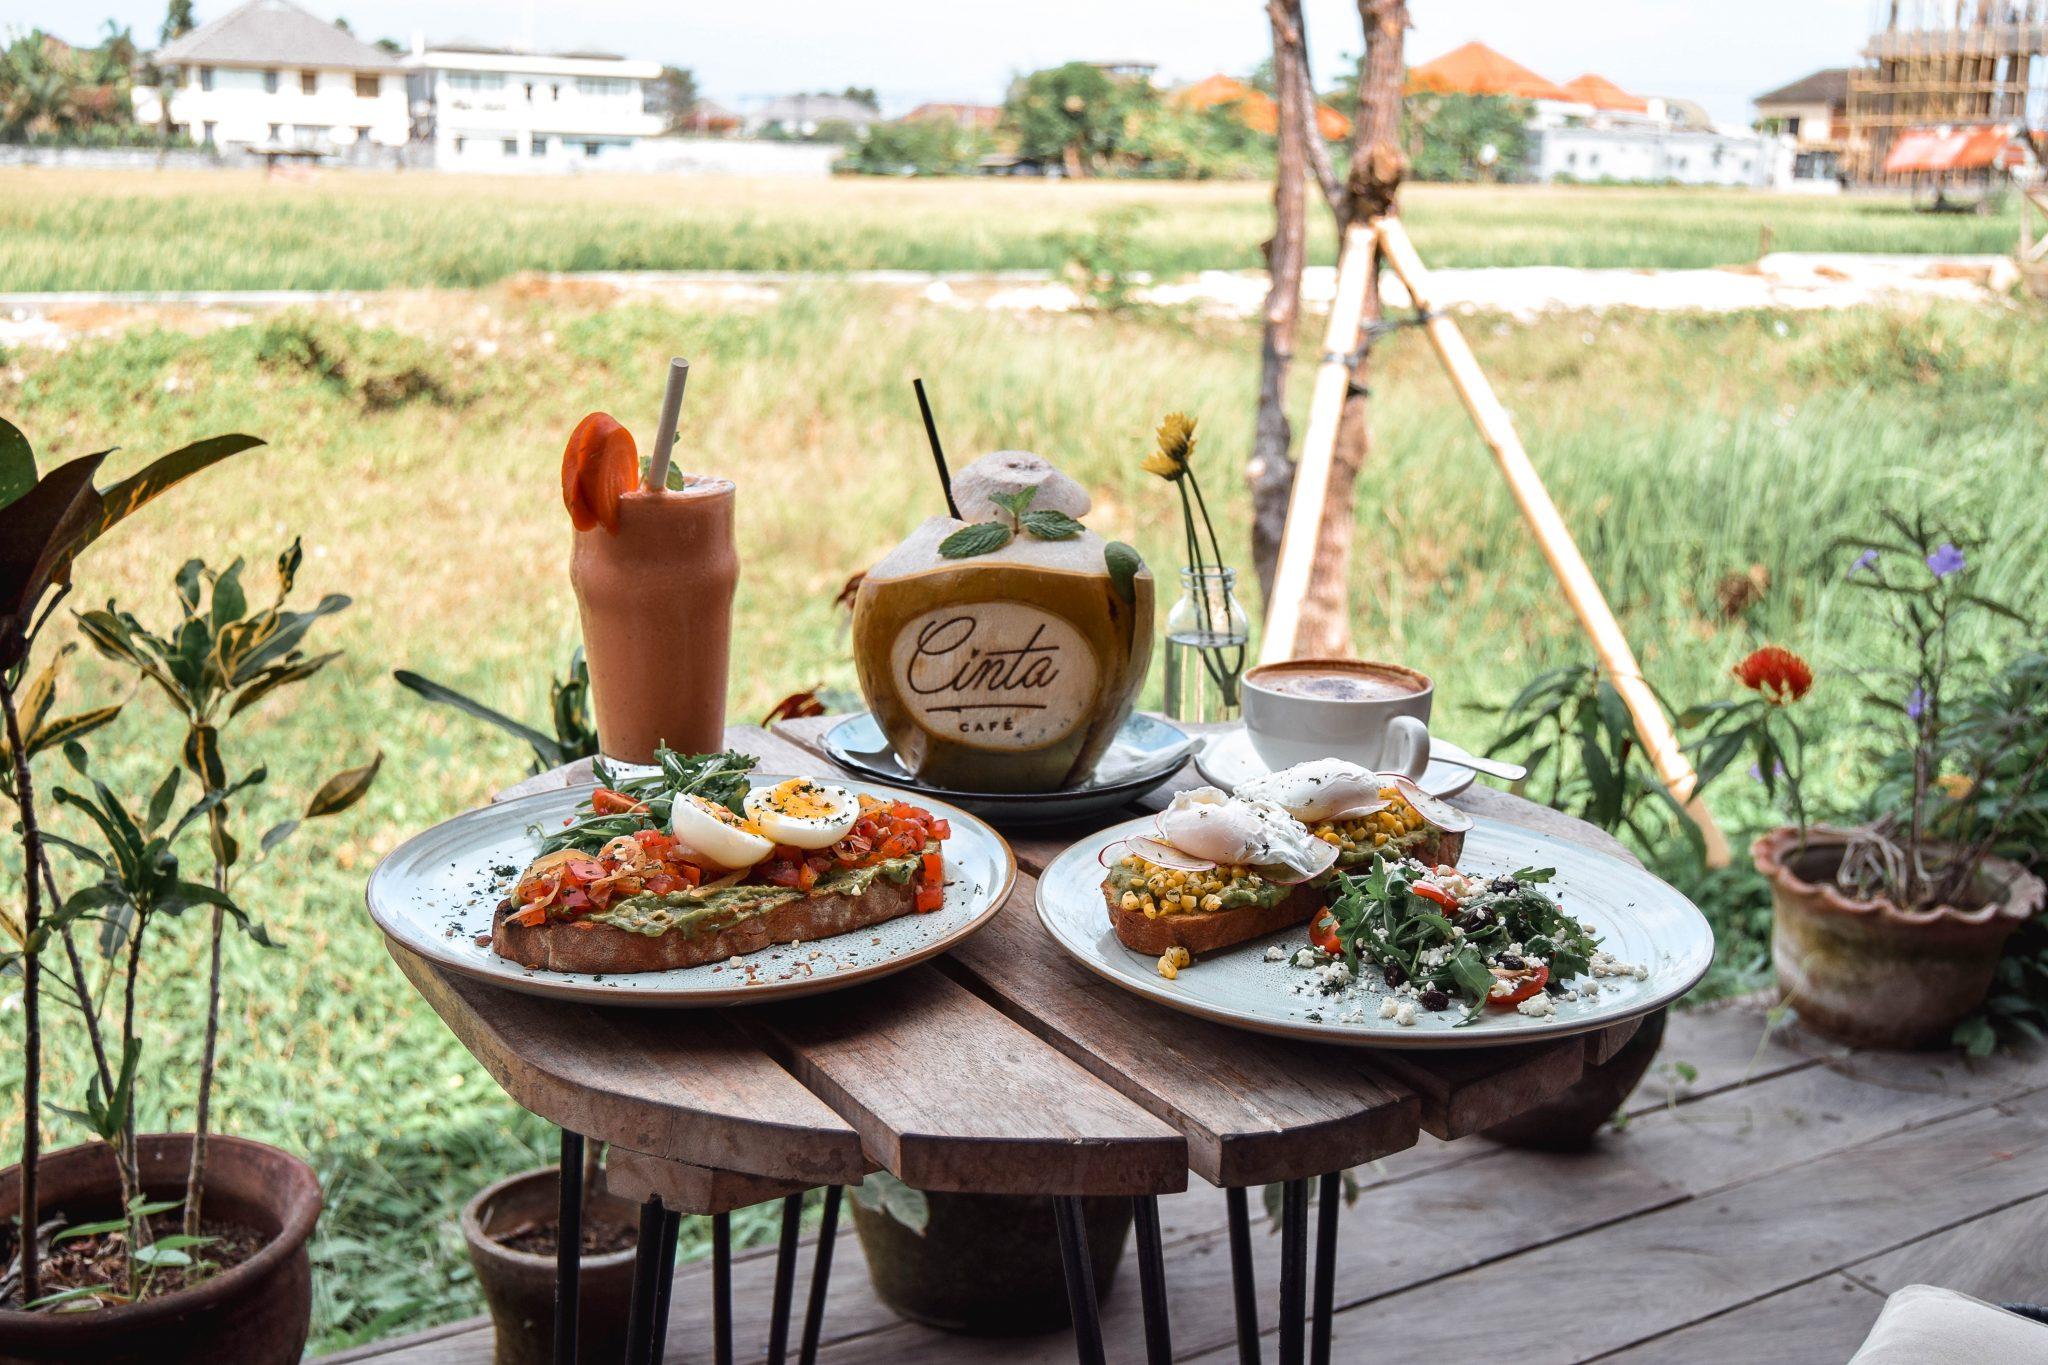 Wanderers & Warriors - Cinta Cafe Canggu Bali - Best Restaurants In Bali Restaurants - Best Restaurants In Canggu